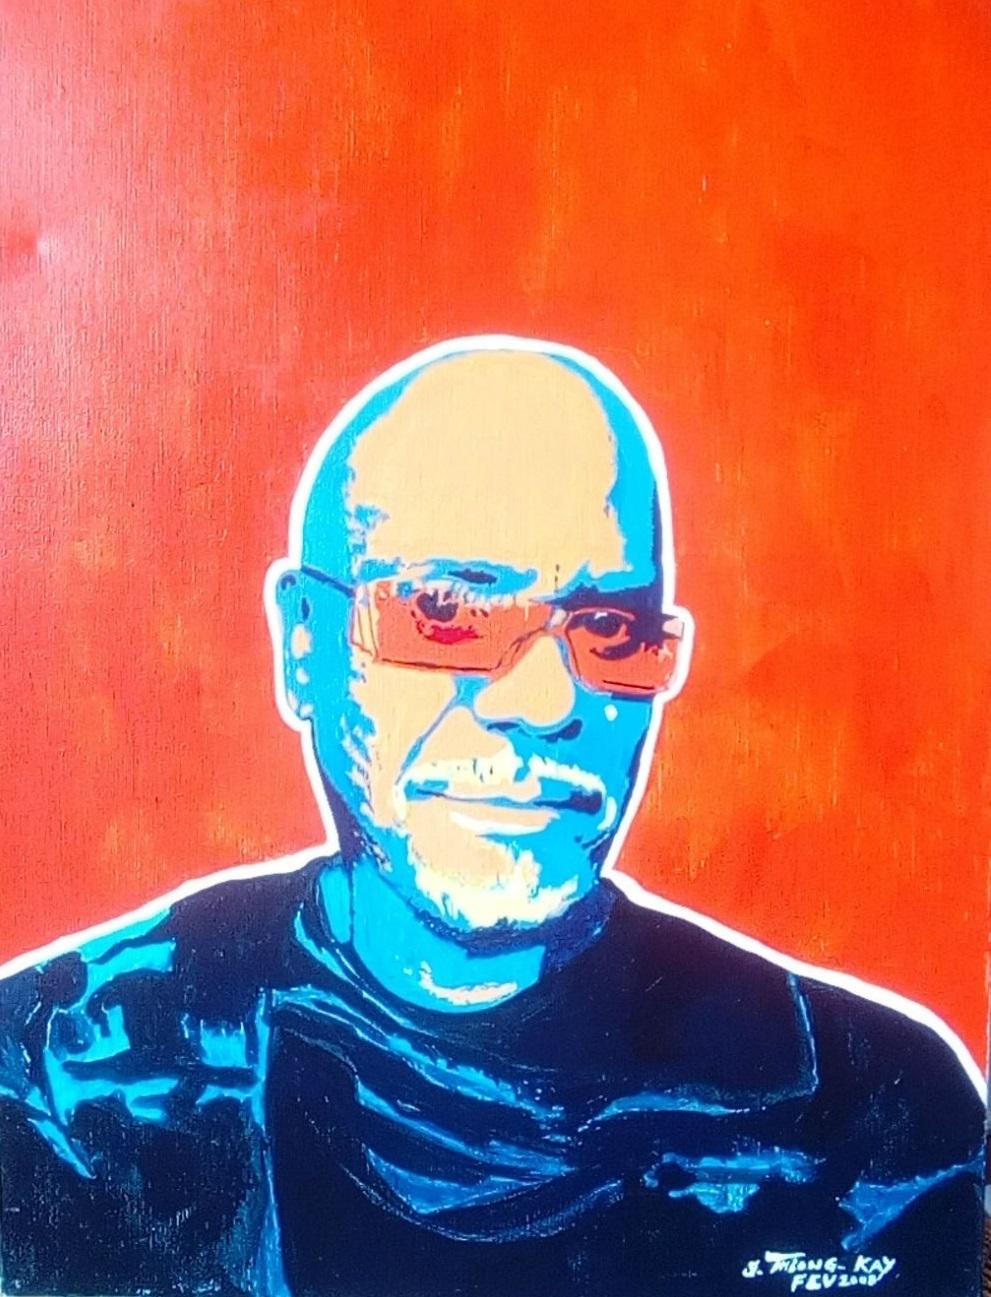 """Auto portrait"" Street Art"